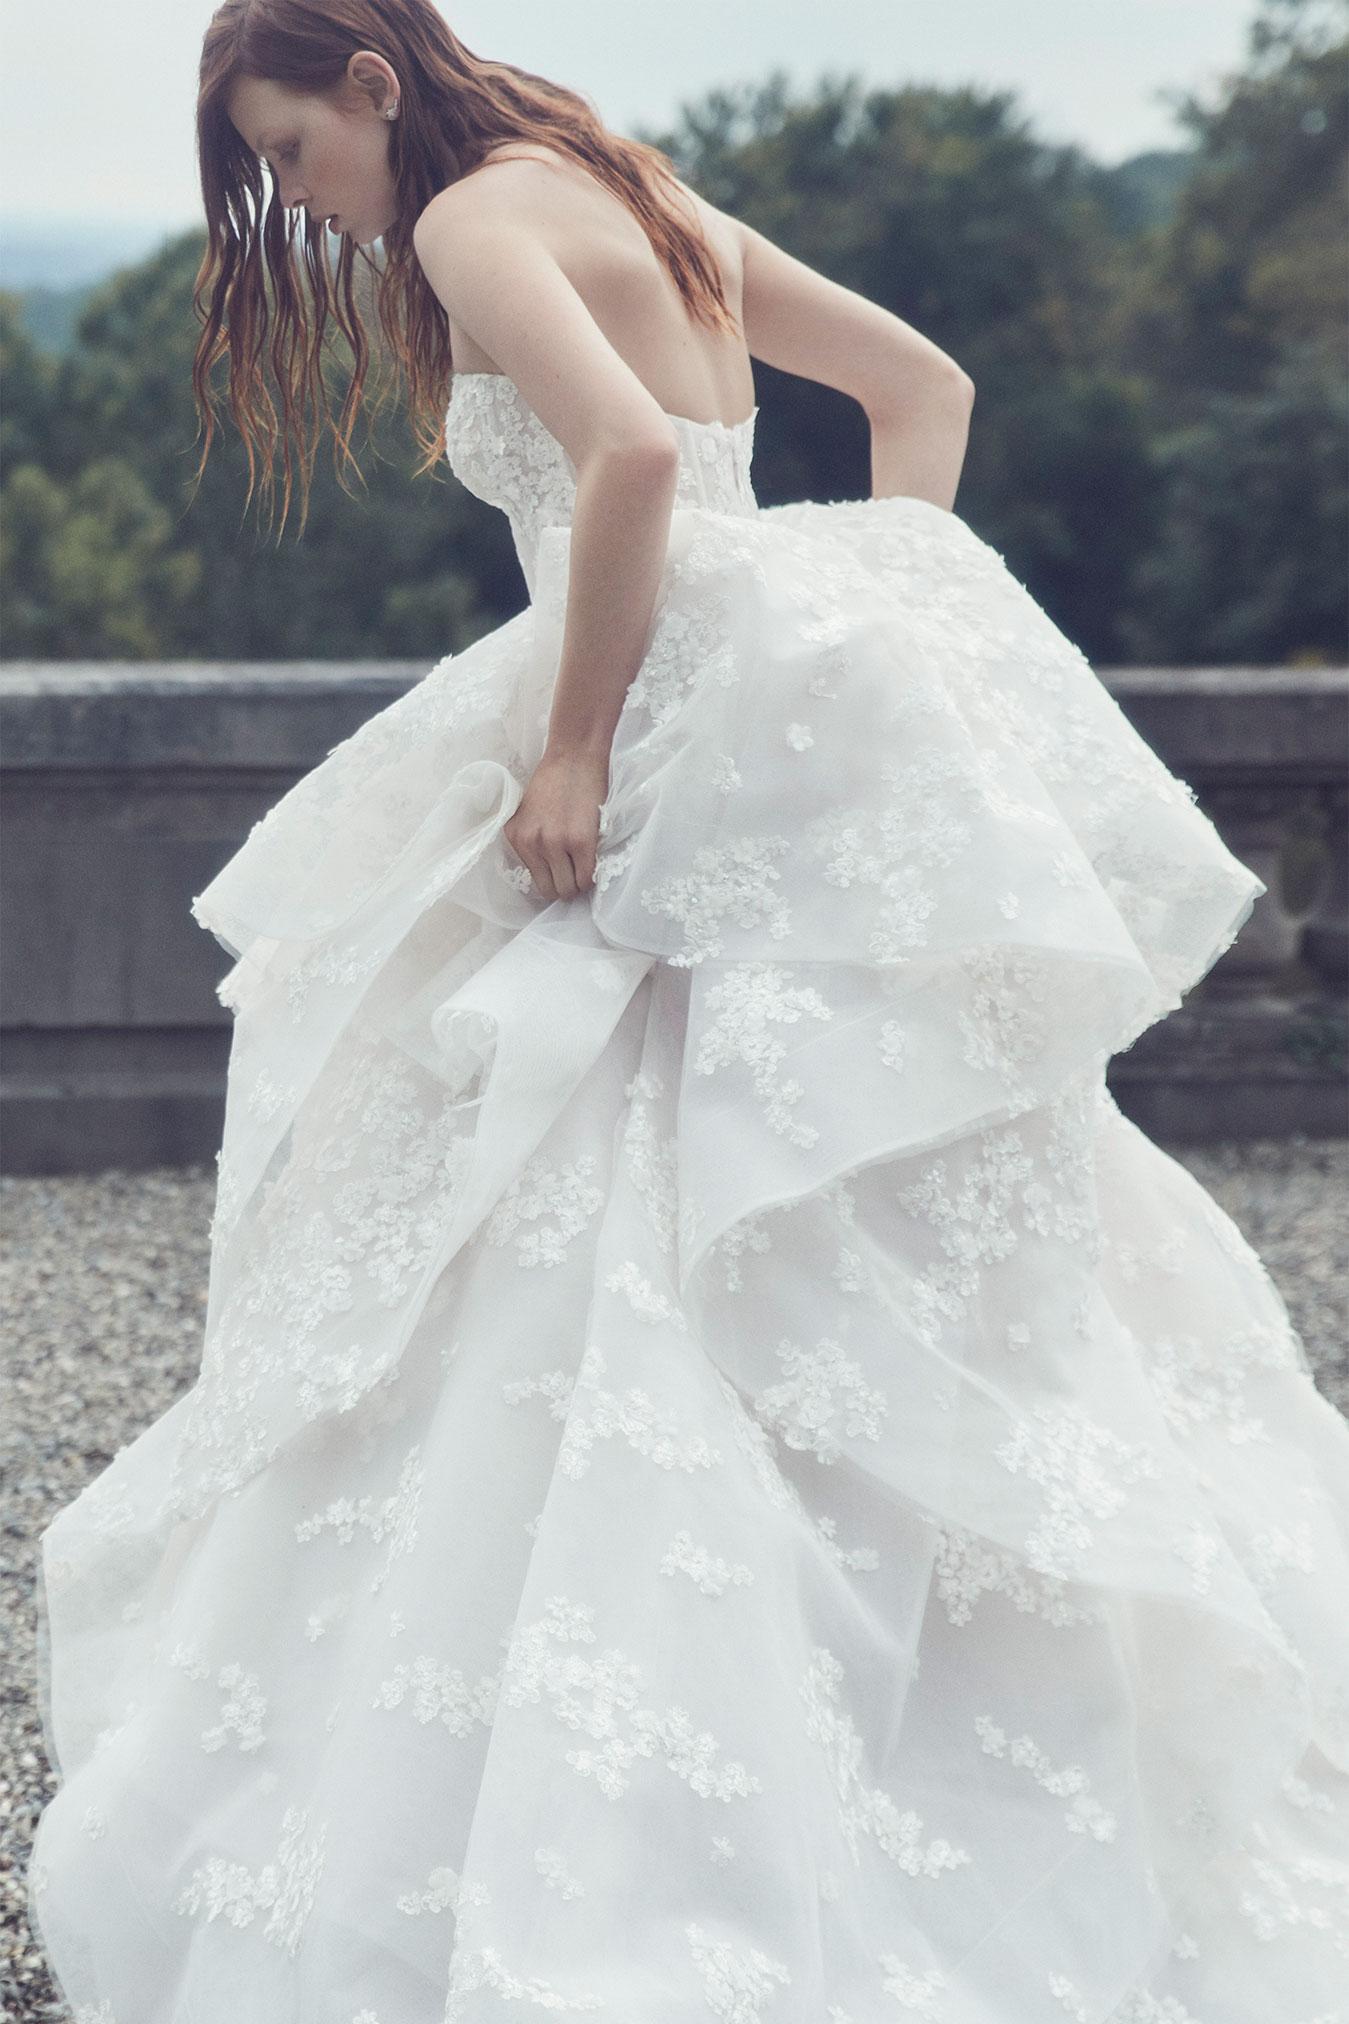 MoniqueLhuillier_Fall_2019_Bridal_Look_8_Everest